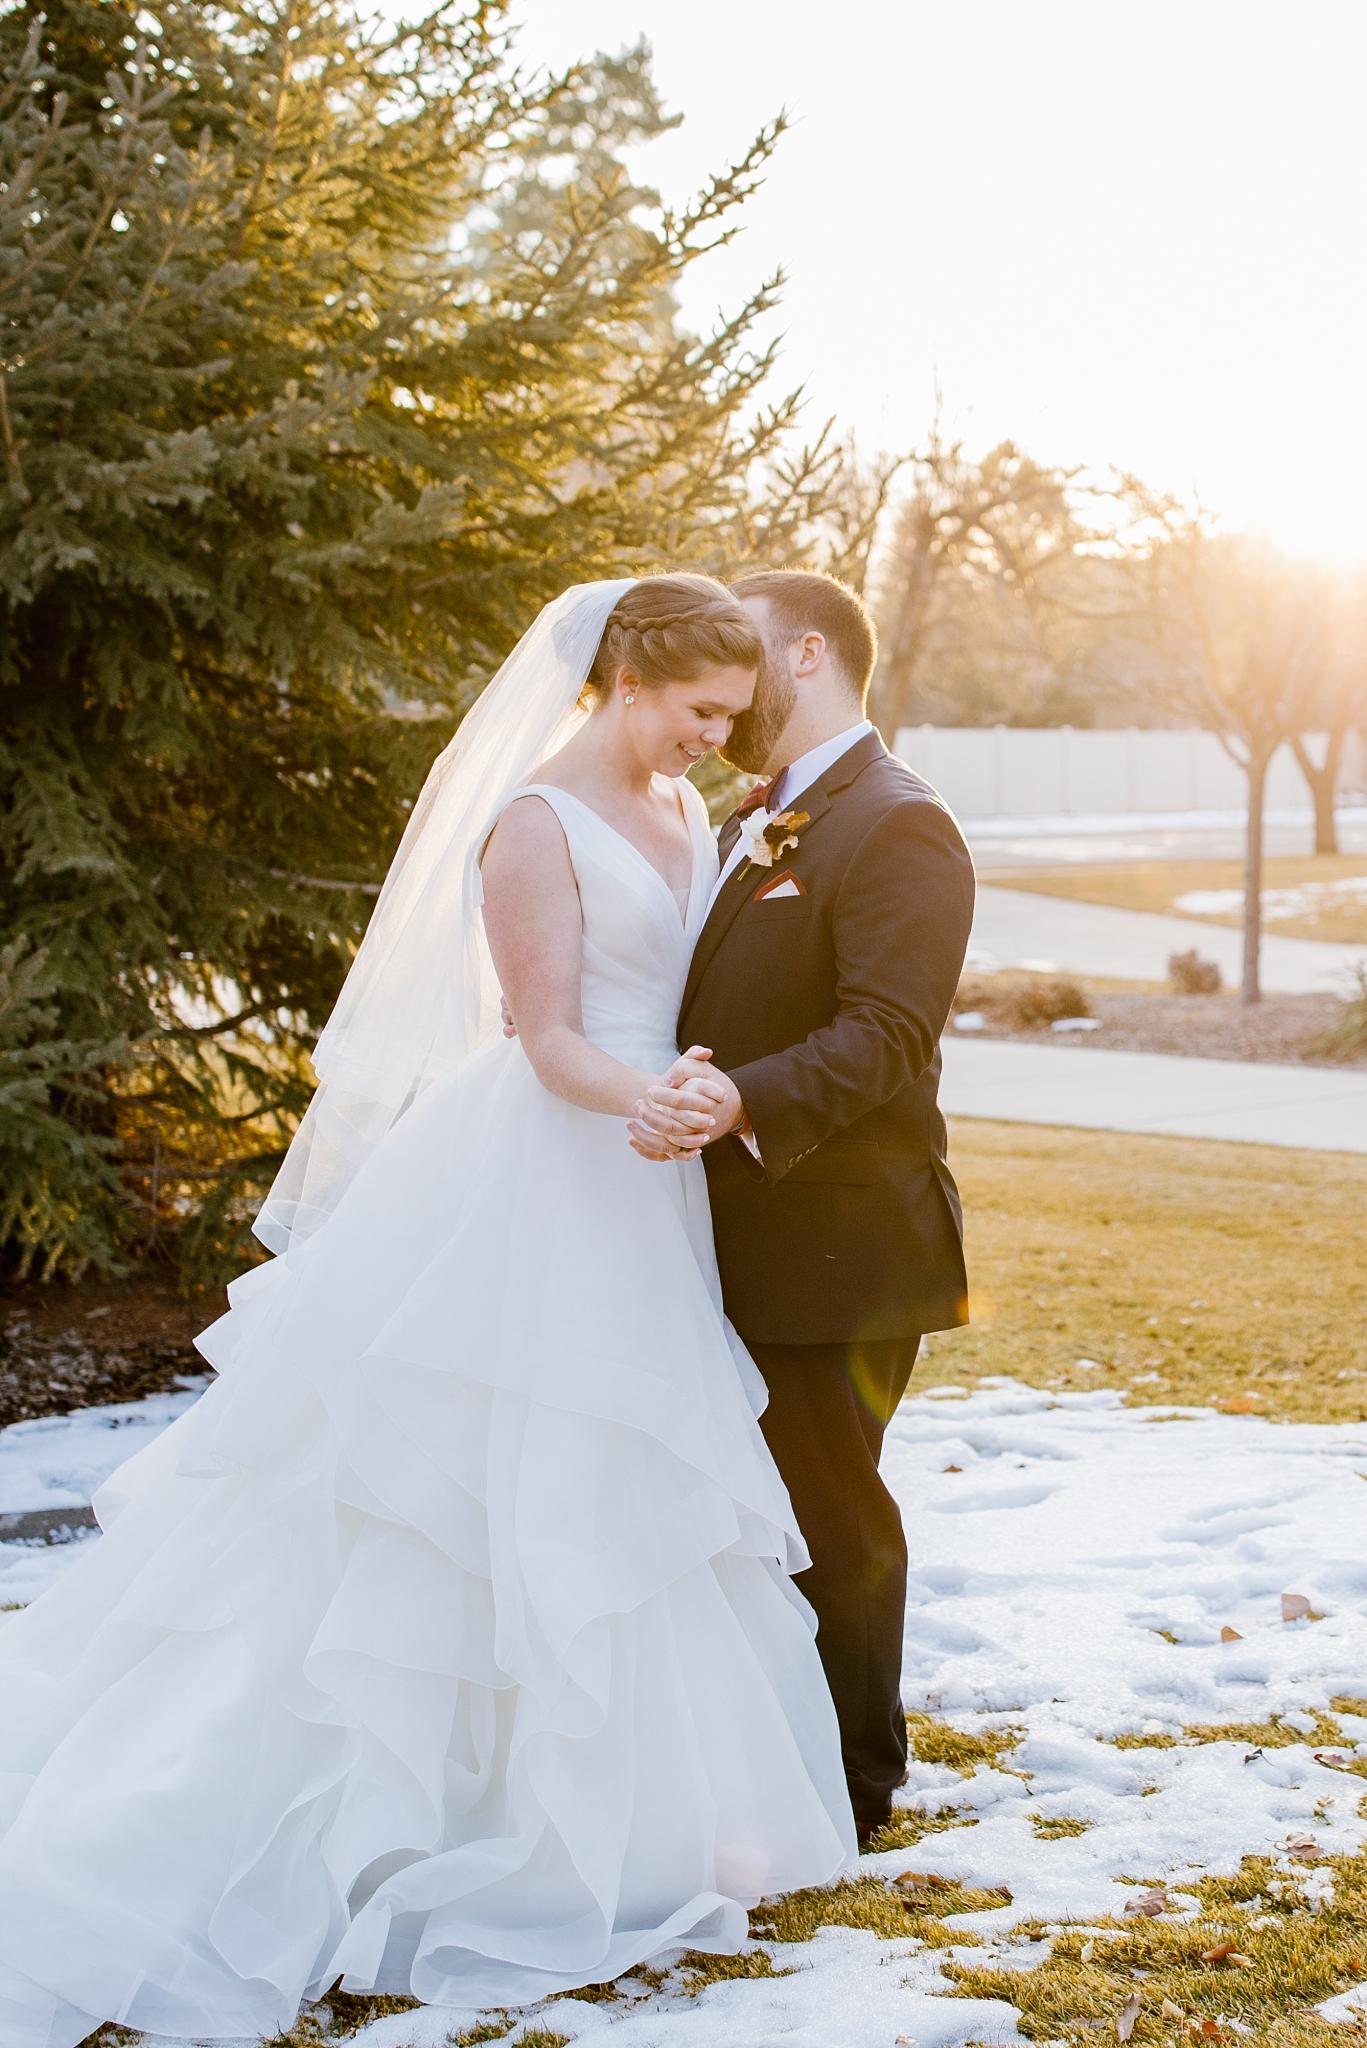 CN-Wedding-264_Lizzie-B-Imagery-Utah-Wedding-Photographer-Blessed-Sacrament-Catholic-Church-Sandy-Utah-The-Blended-Table-Salt-Lake-City.jpg